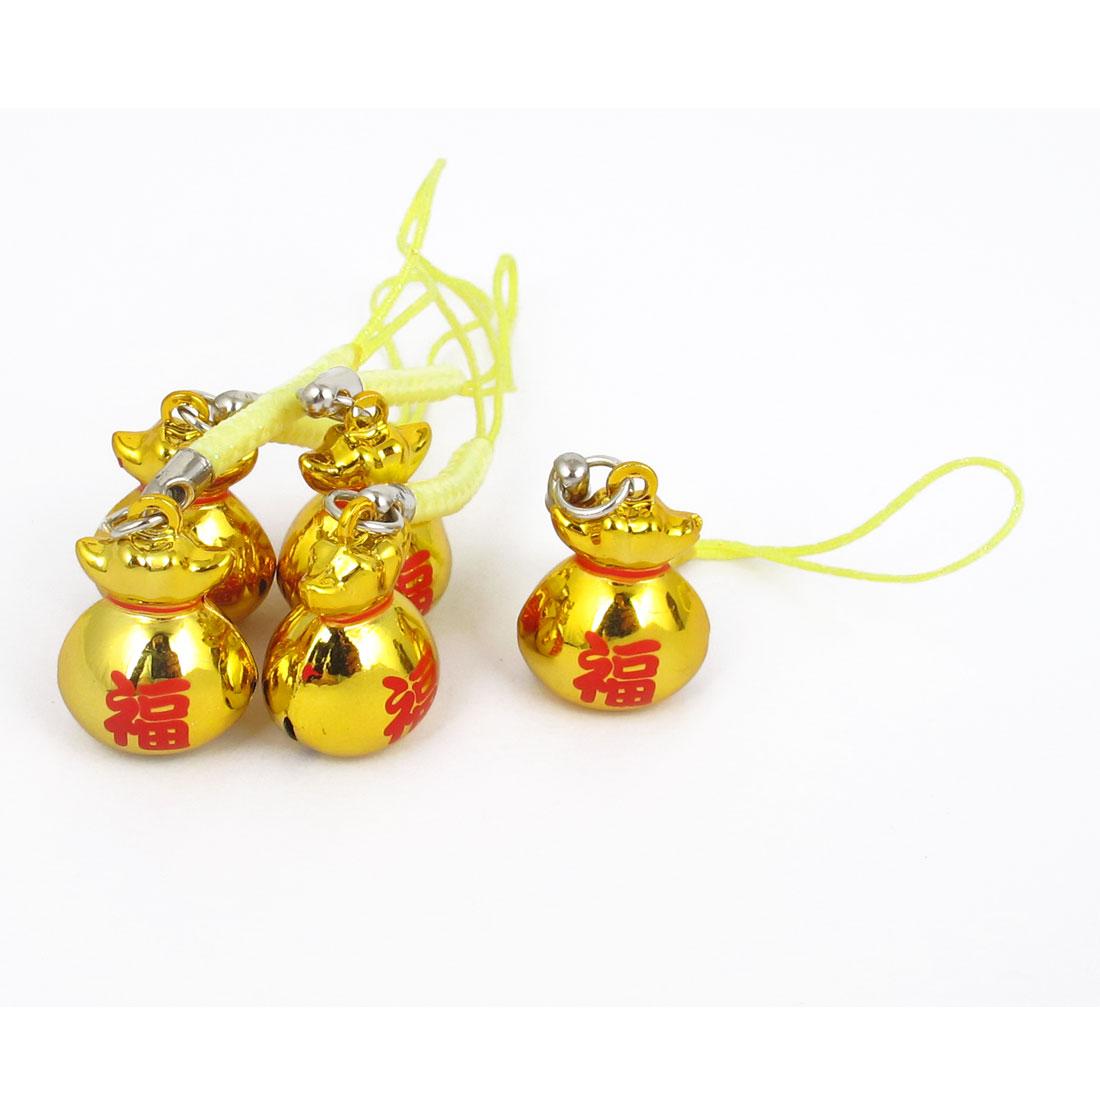 Metal Lucky Bag Ring Bell Ornament Gold Tone 18mm Diameter 5 Pcs